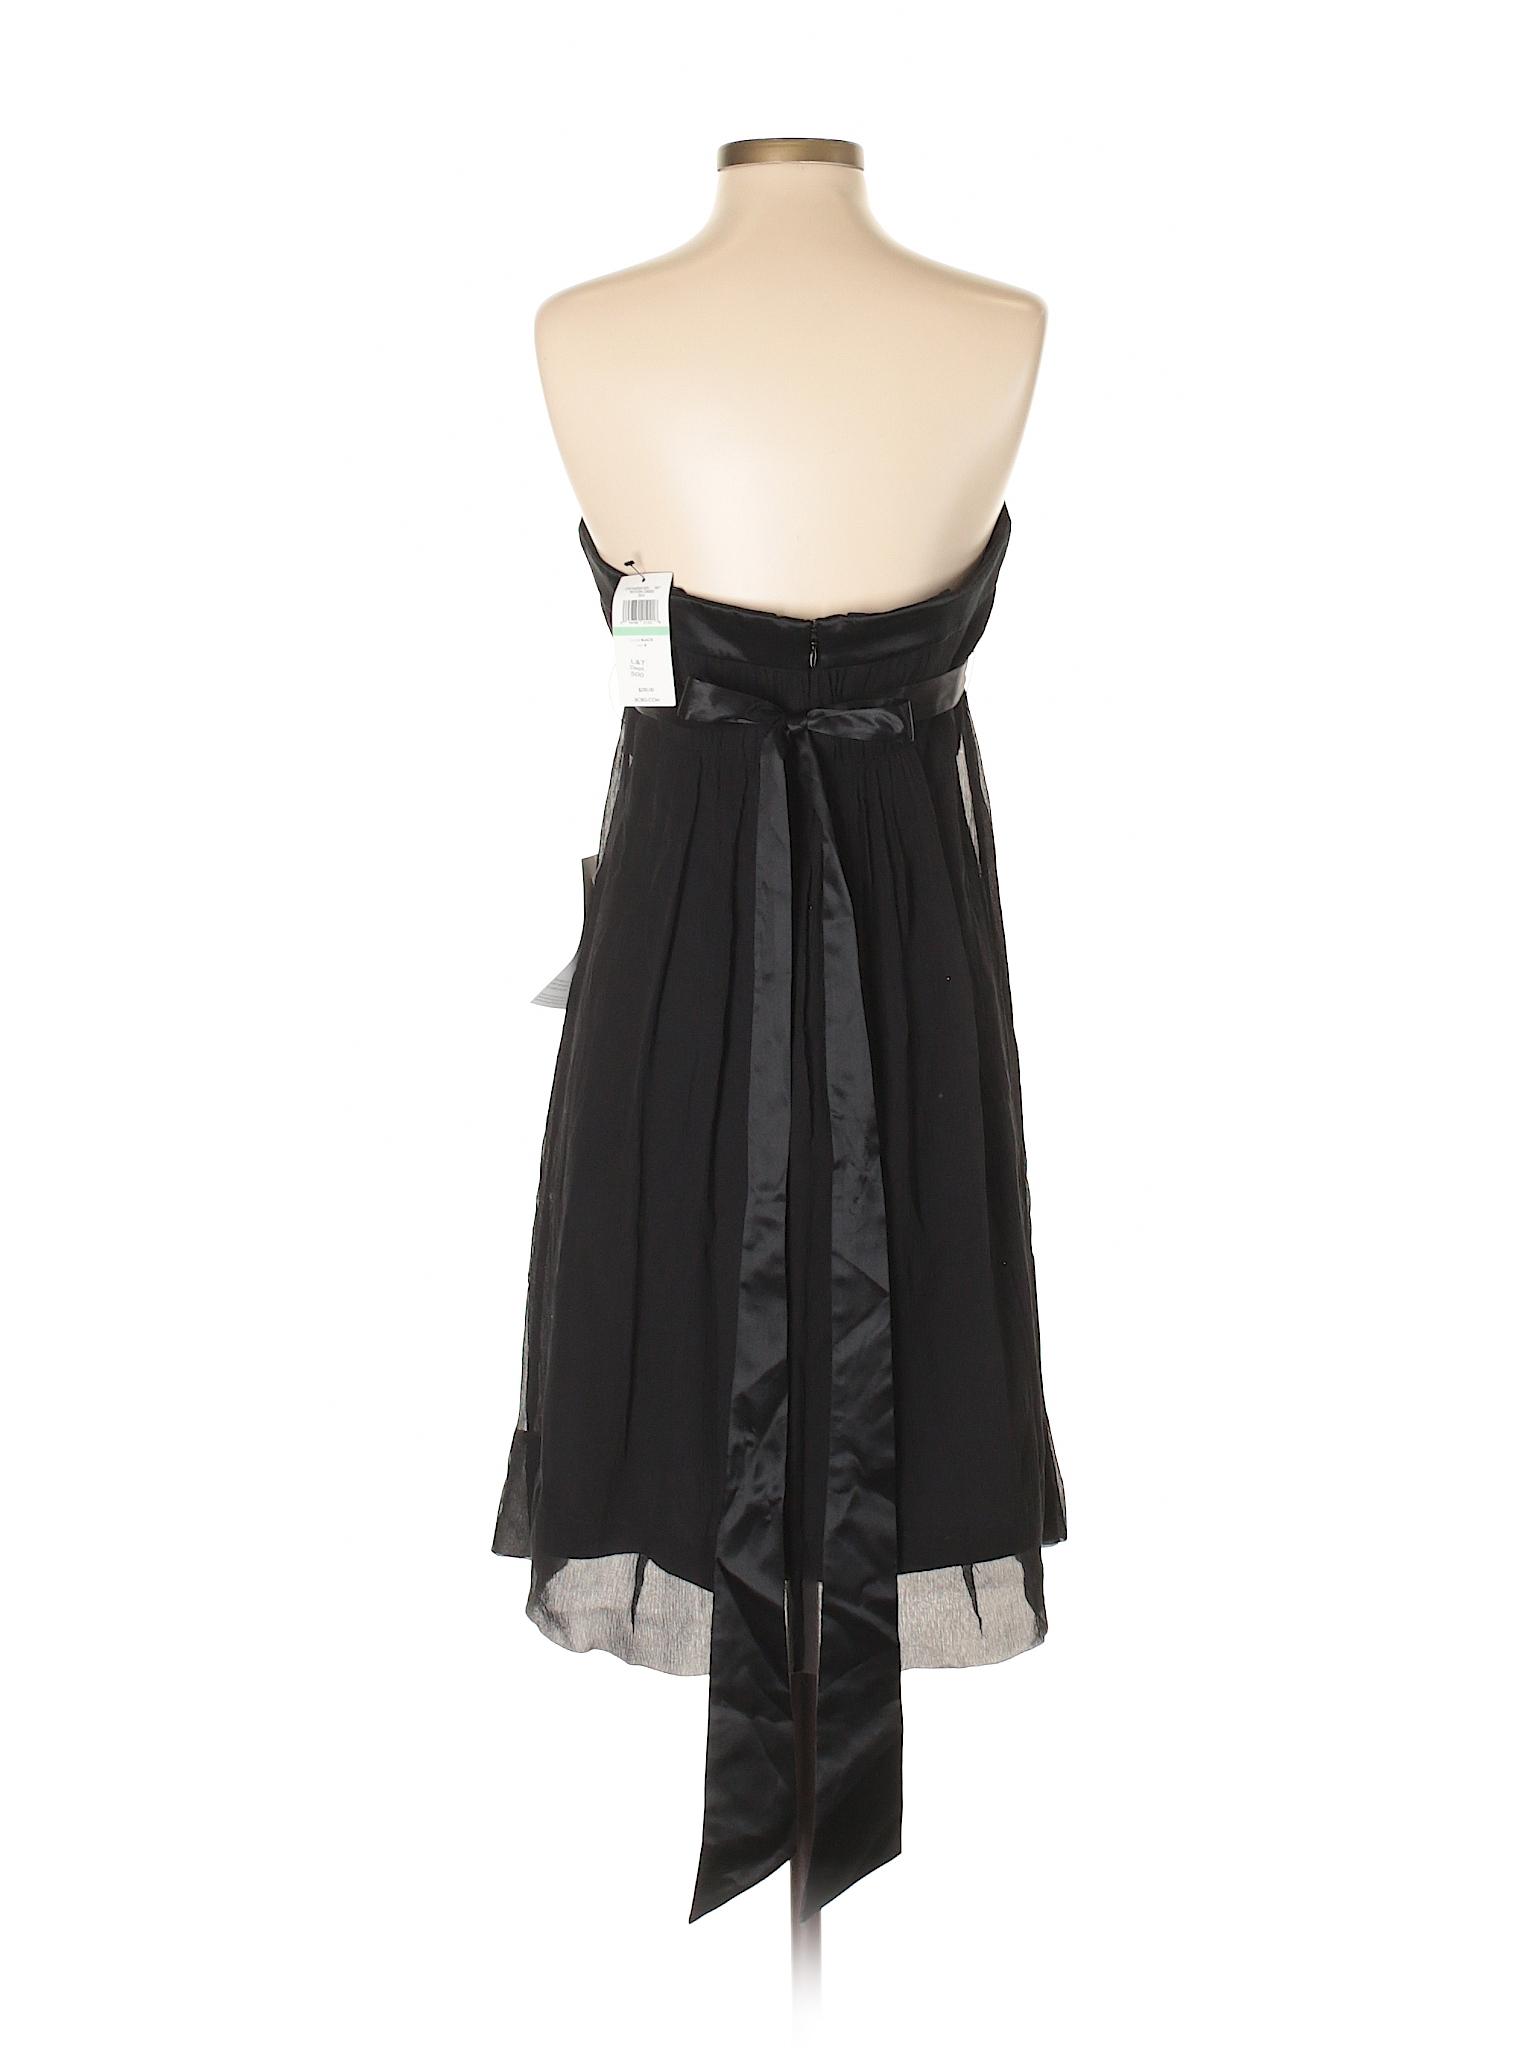 Dress Dress Boutique Boutique Boutique BCBGMAXAZRIA BCBGMAXAZRIA Dress BCBGMAXAZRIA Boutique winter winter Casual winter Casual Casual tEEwpqr